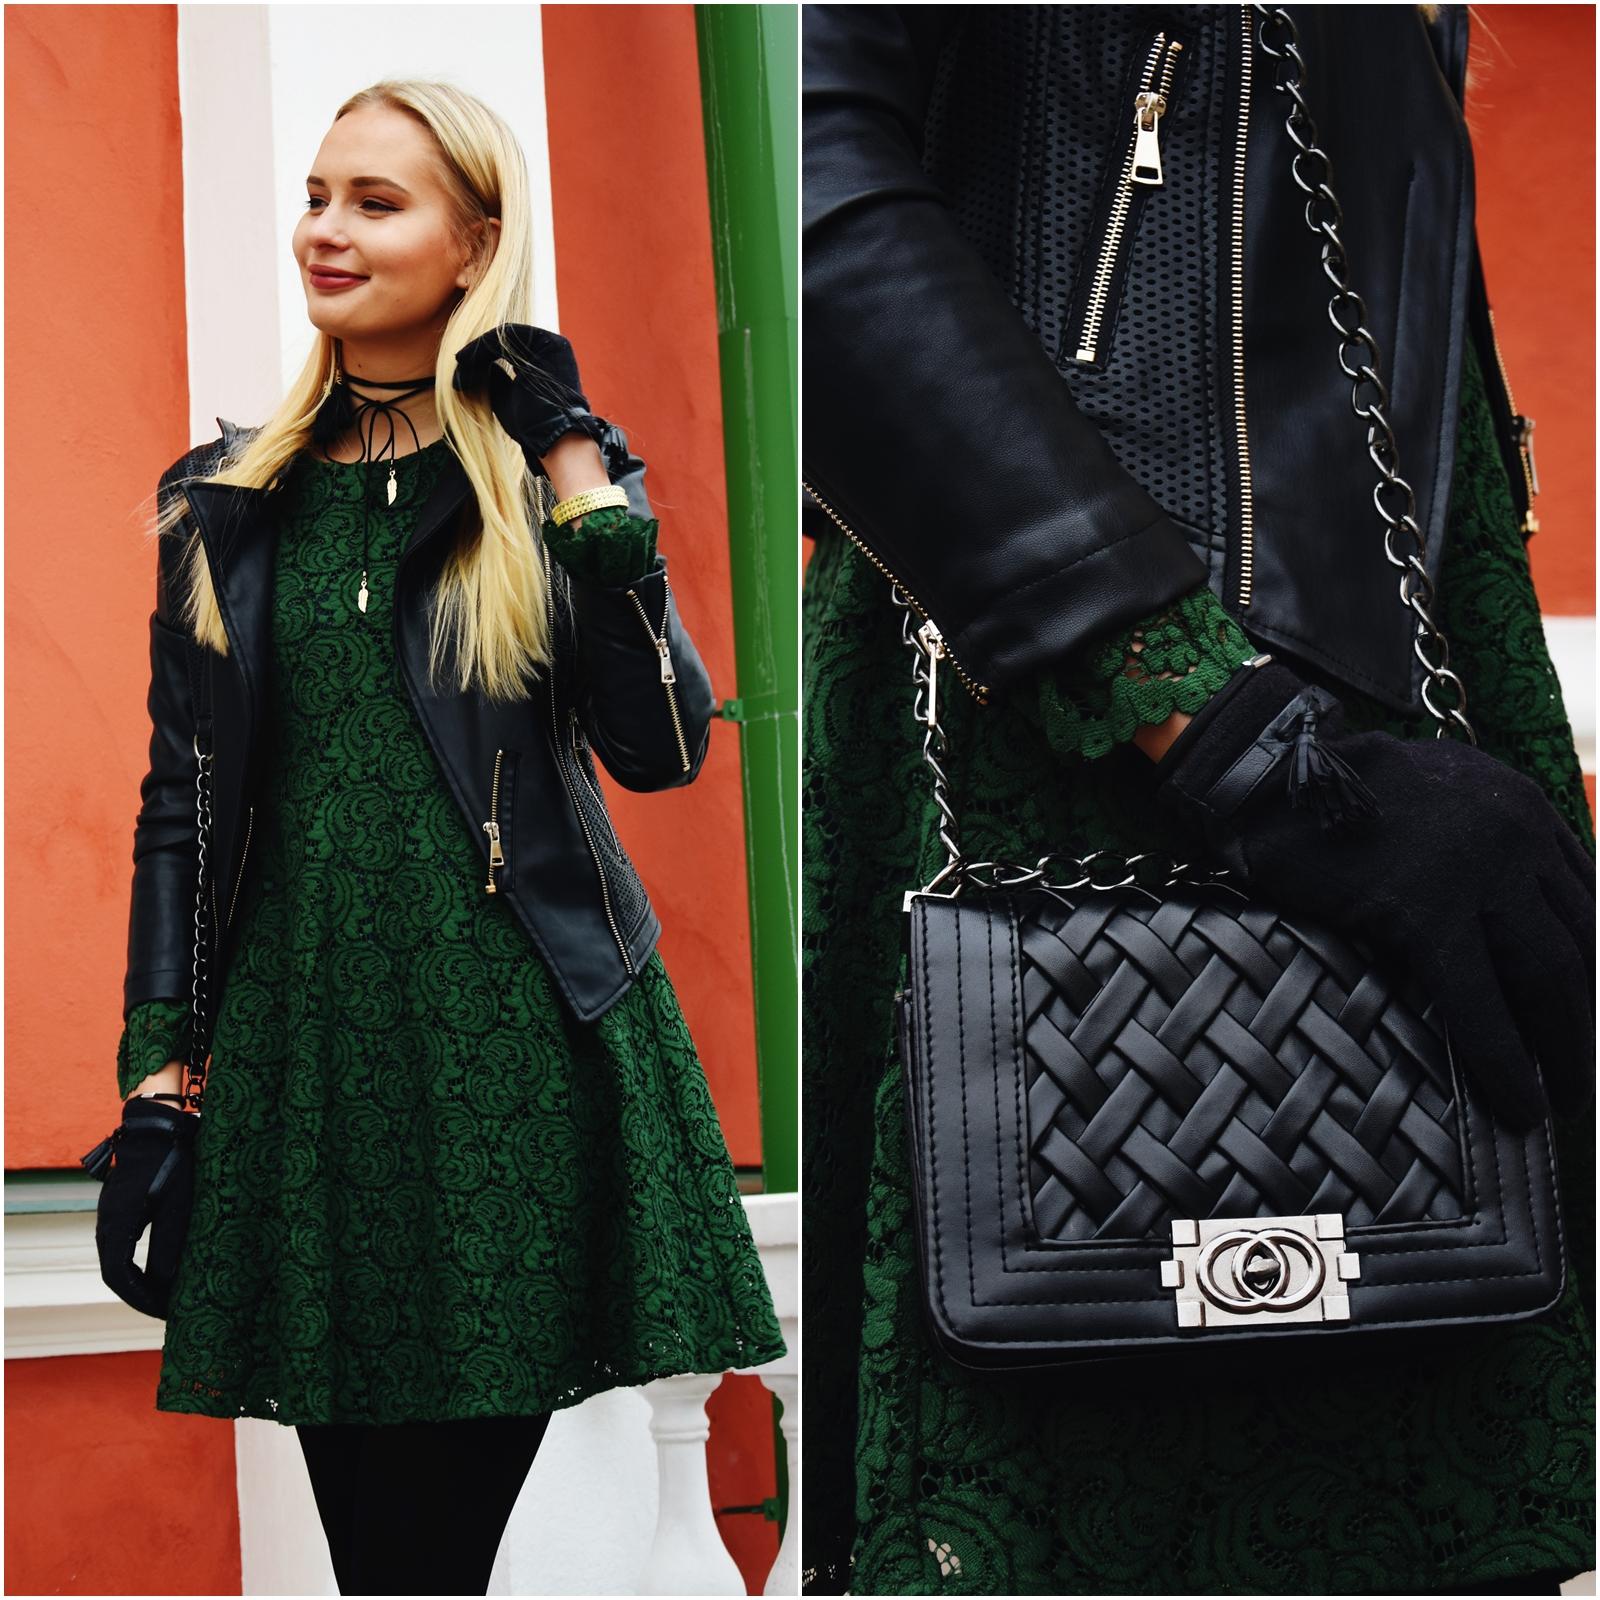 Fashion blogger goes to fashion week